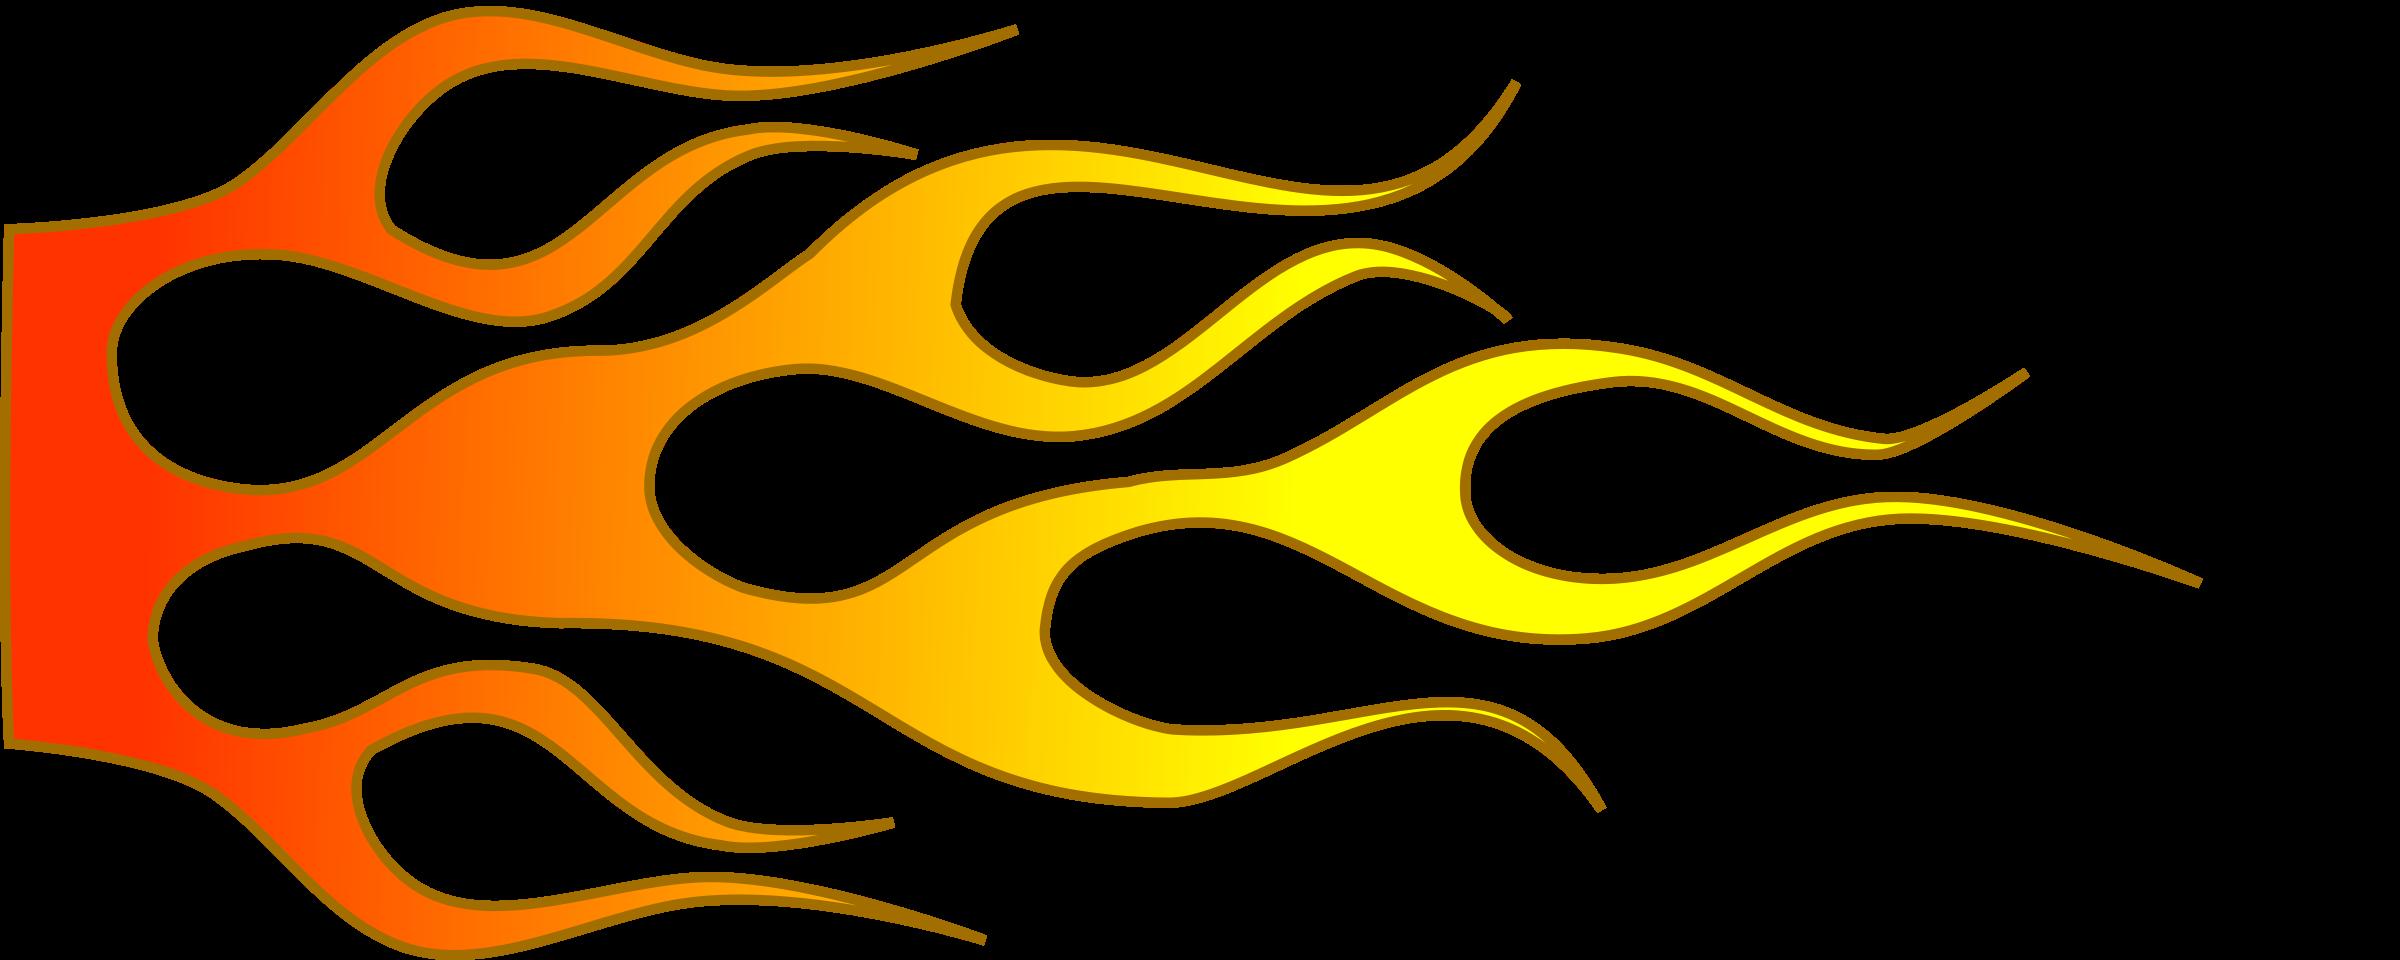 Flame Logo Designs Clipart.